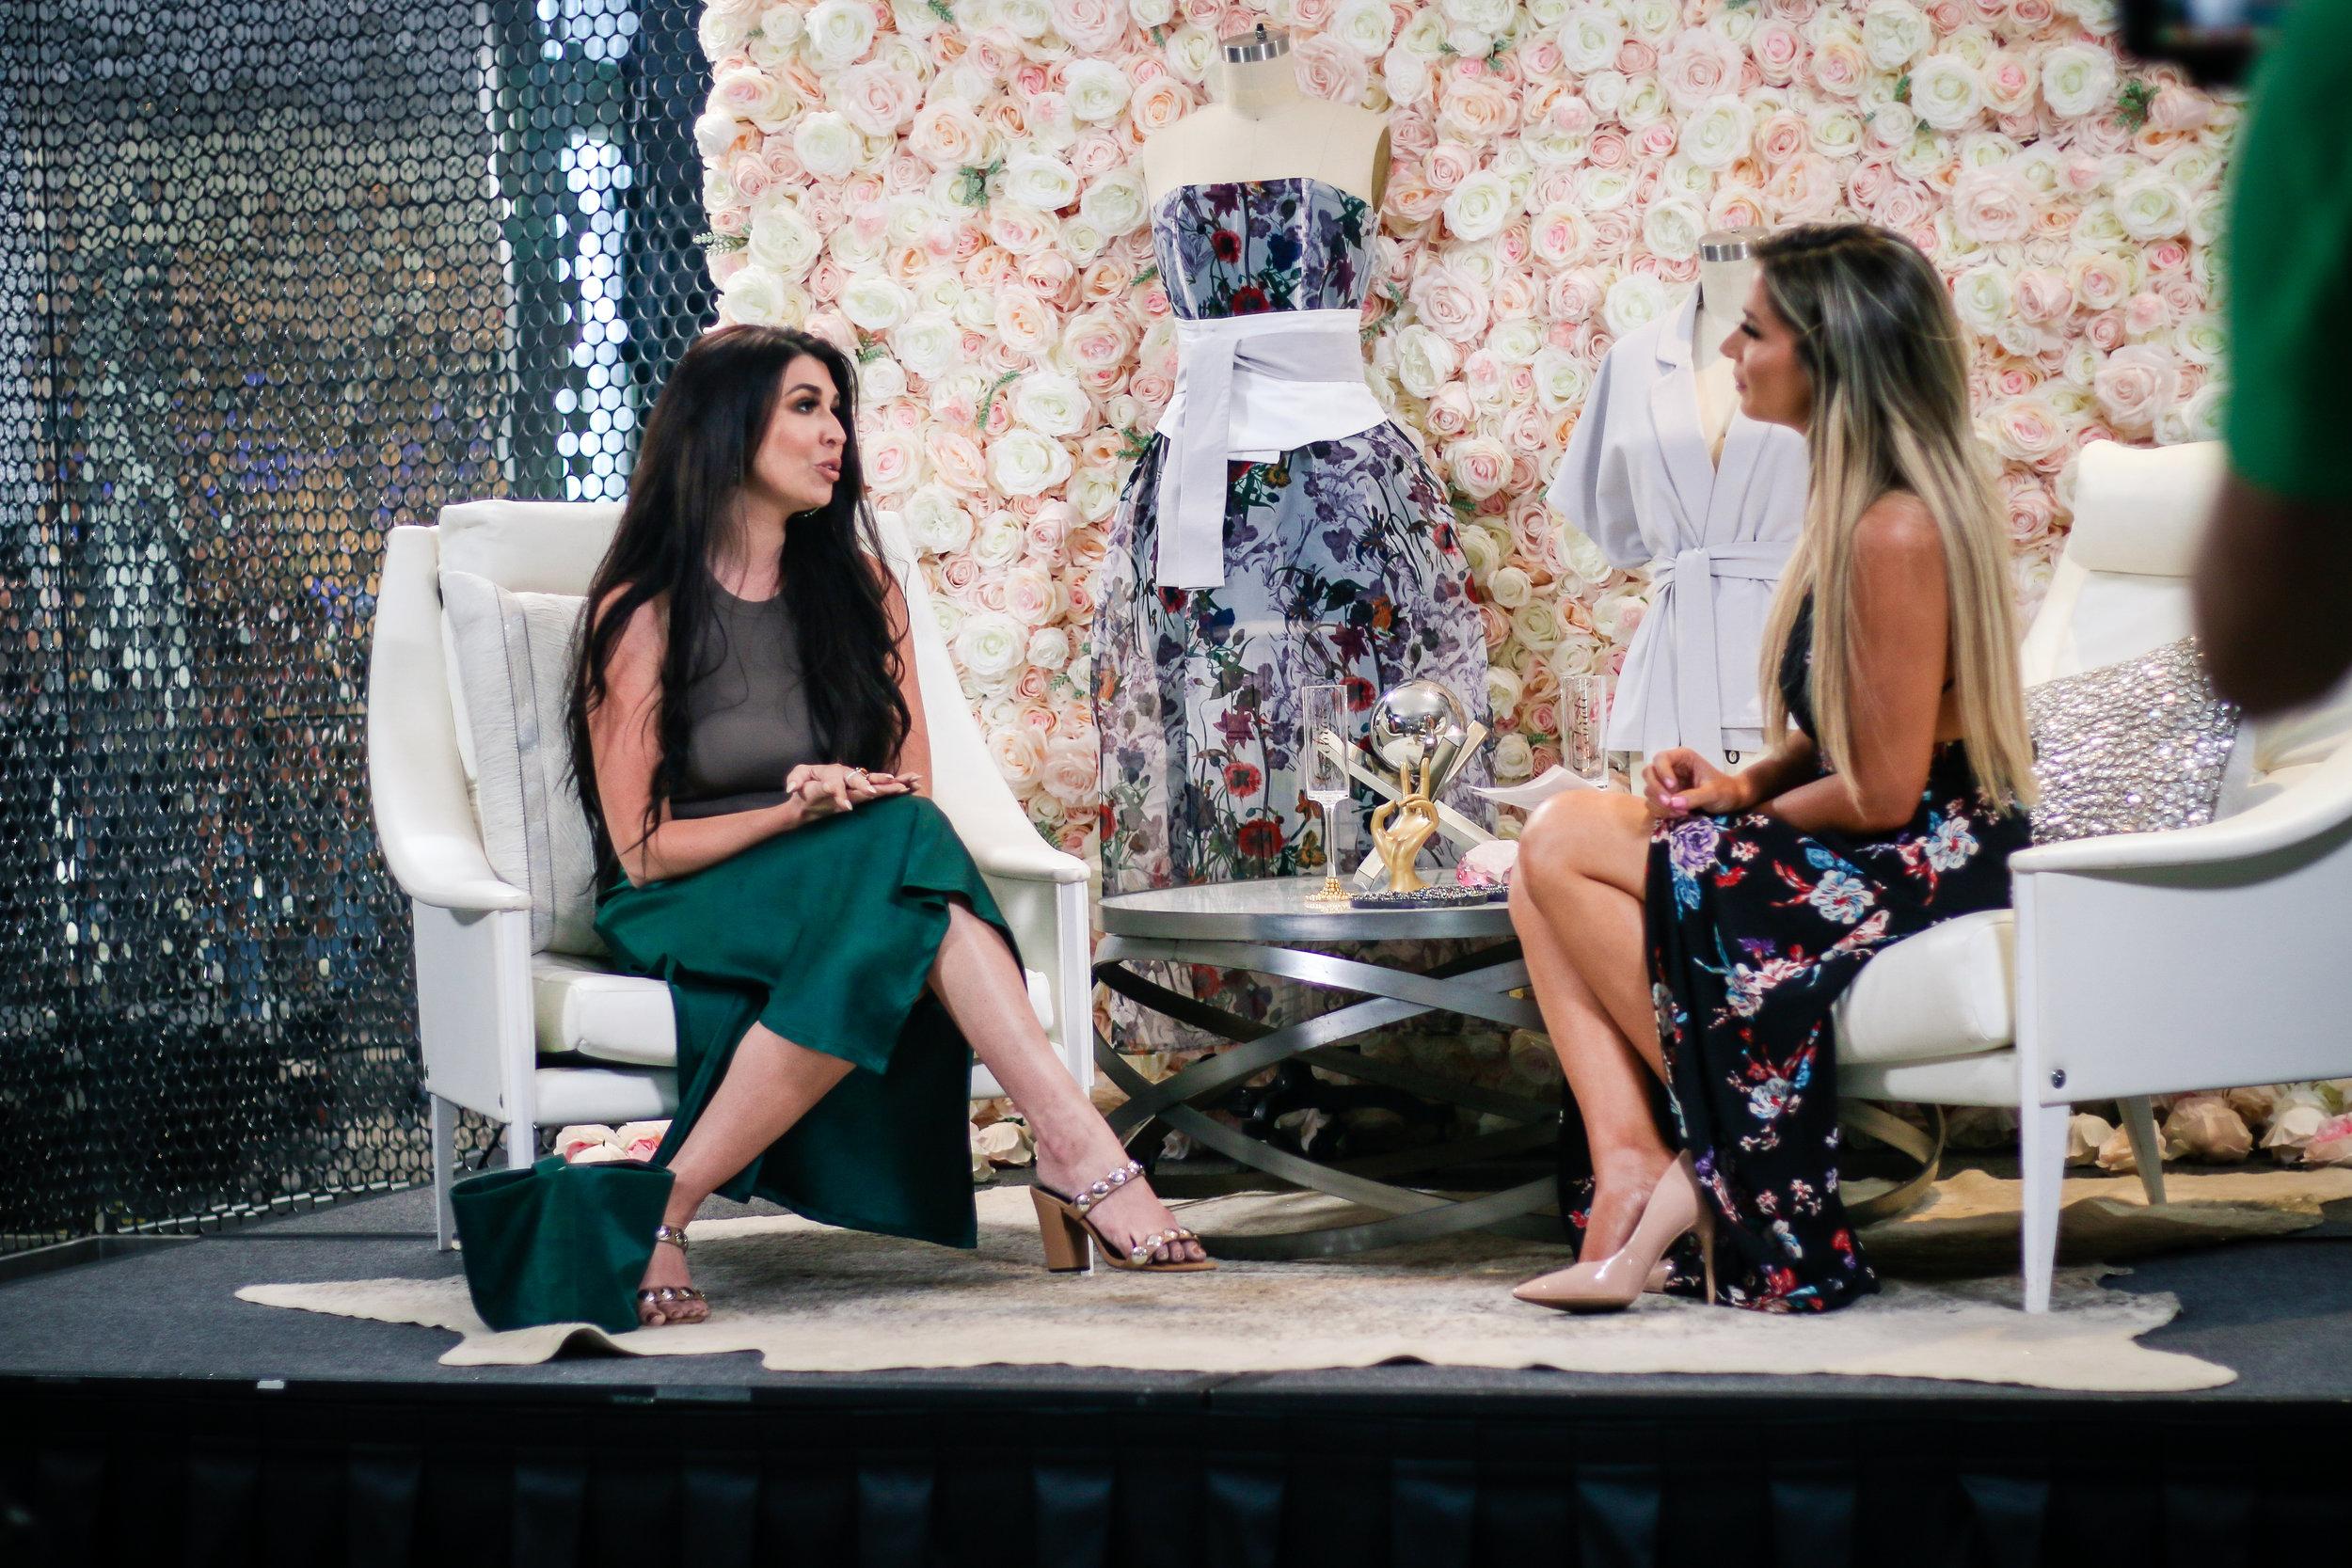 Bravo's Project Runway Designer Lela Orr  Lela is the founder of eco-luxury clothing line  Ferrah